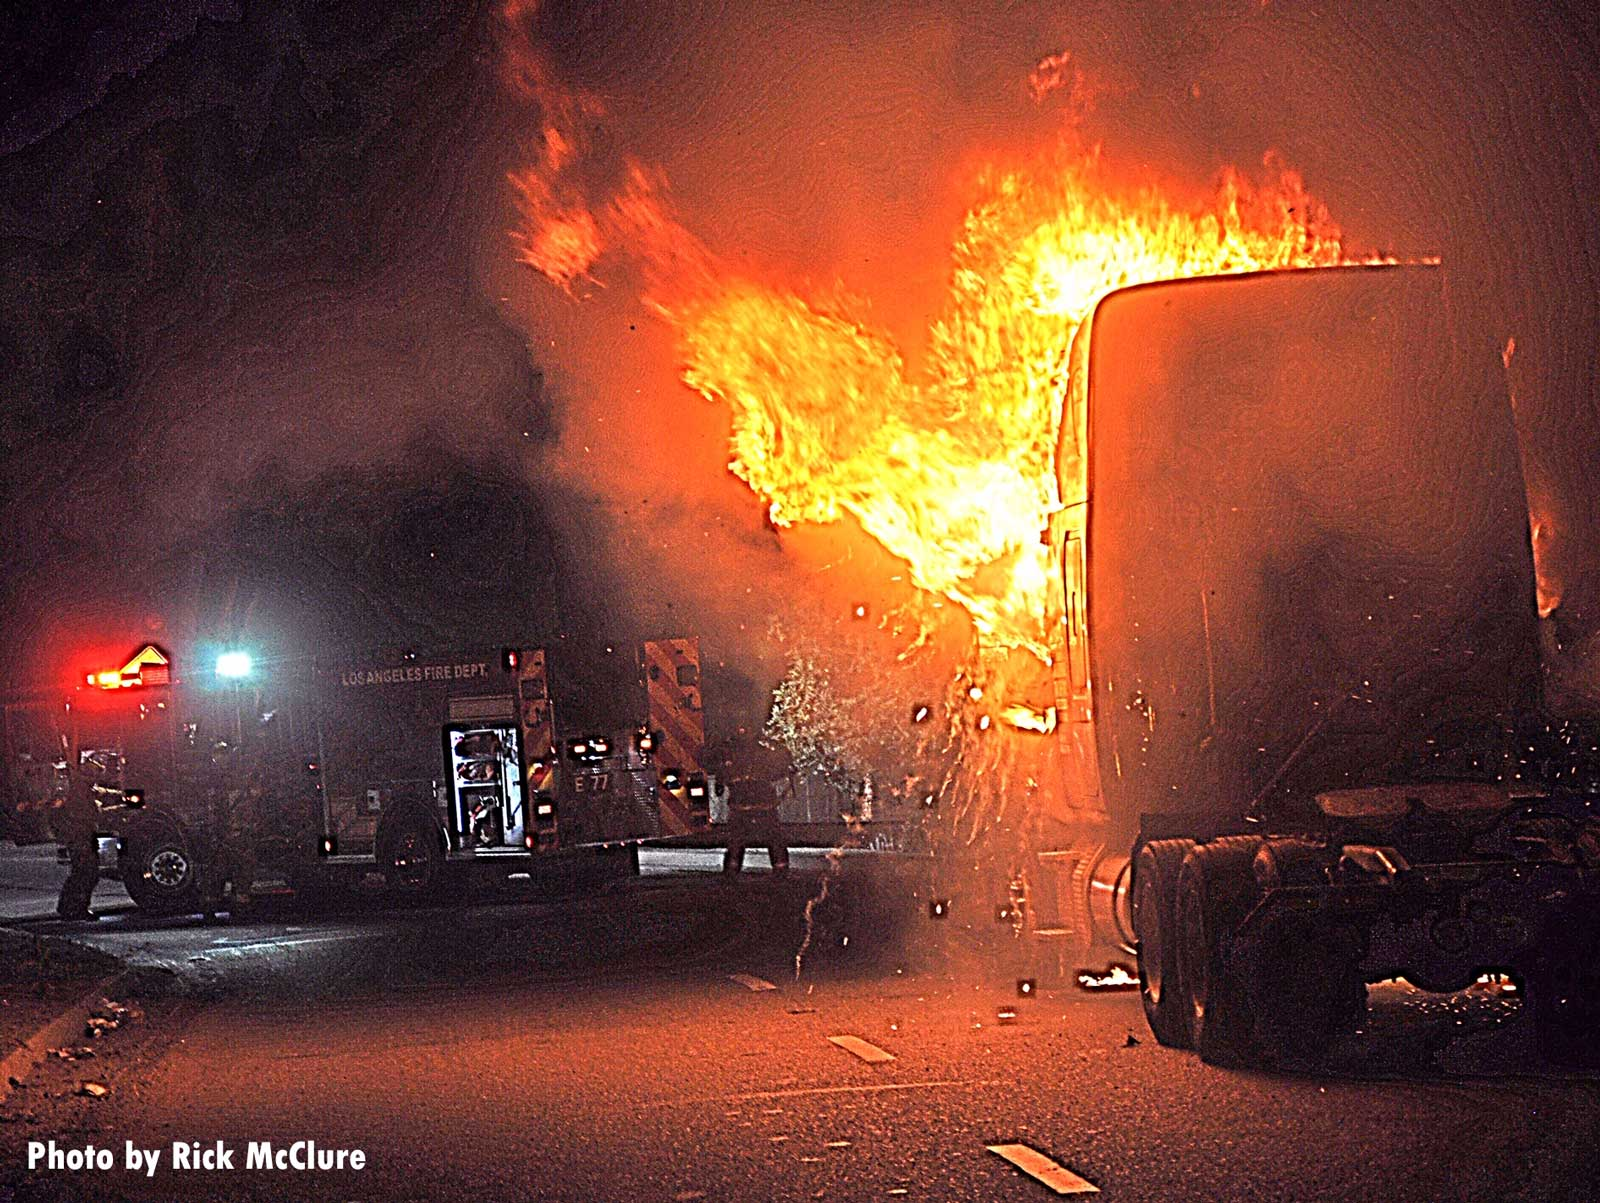 LAFD fire truck at the scene of a semi truck fire